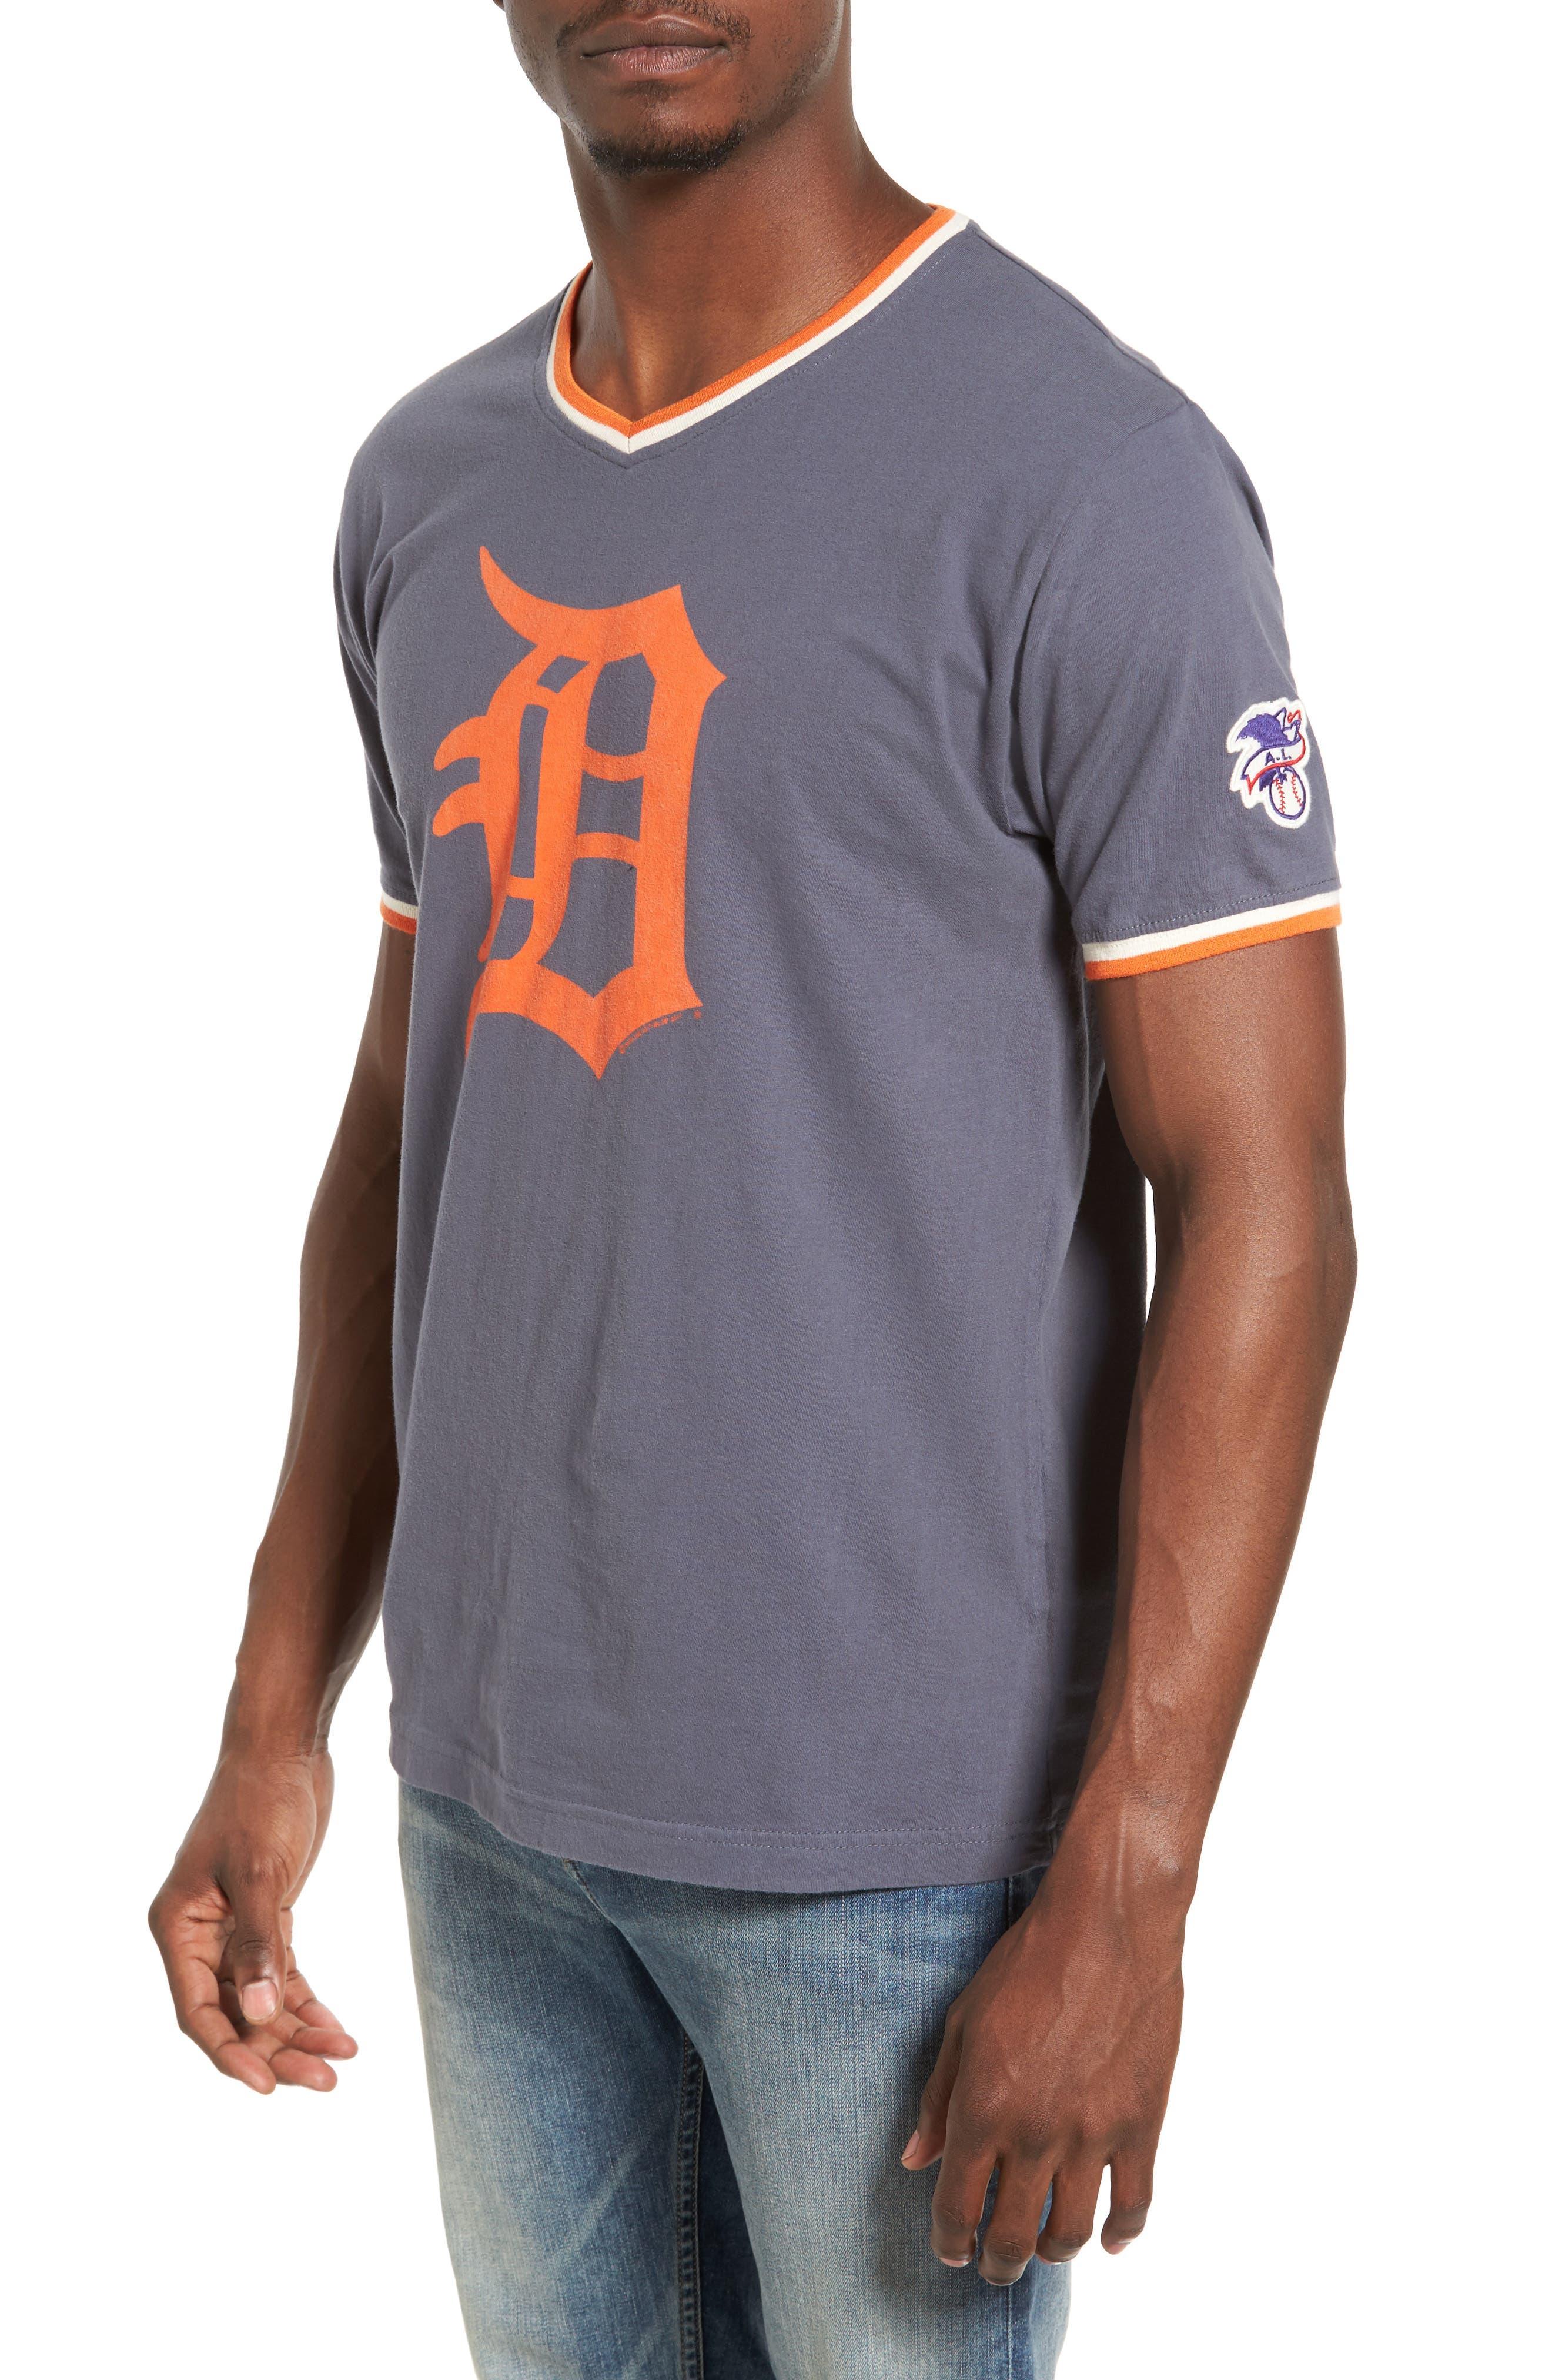 Eastwood Detroit Tigers T-Shirt,                             Main thumbnail 1, color,                             410